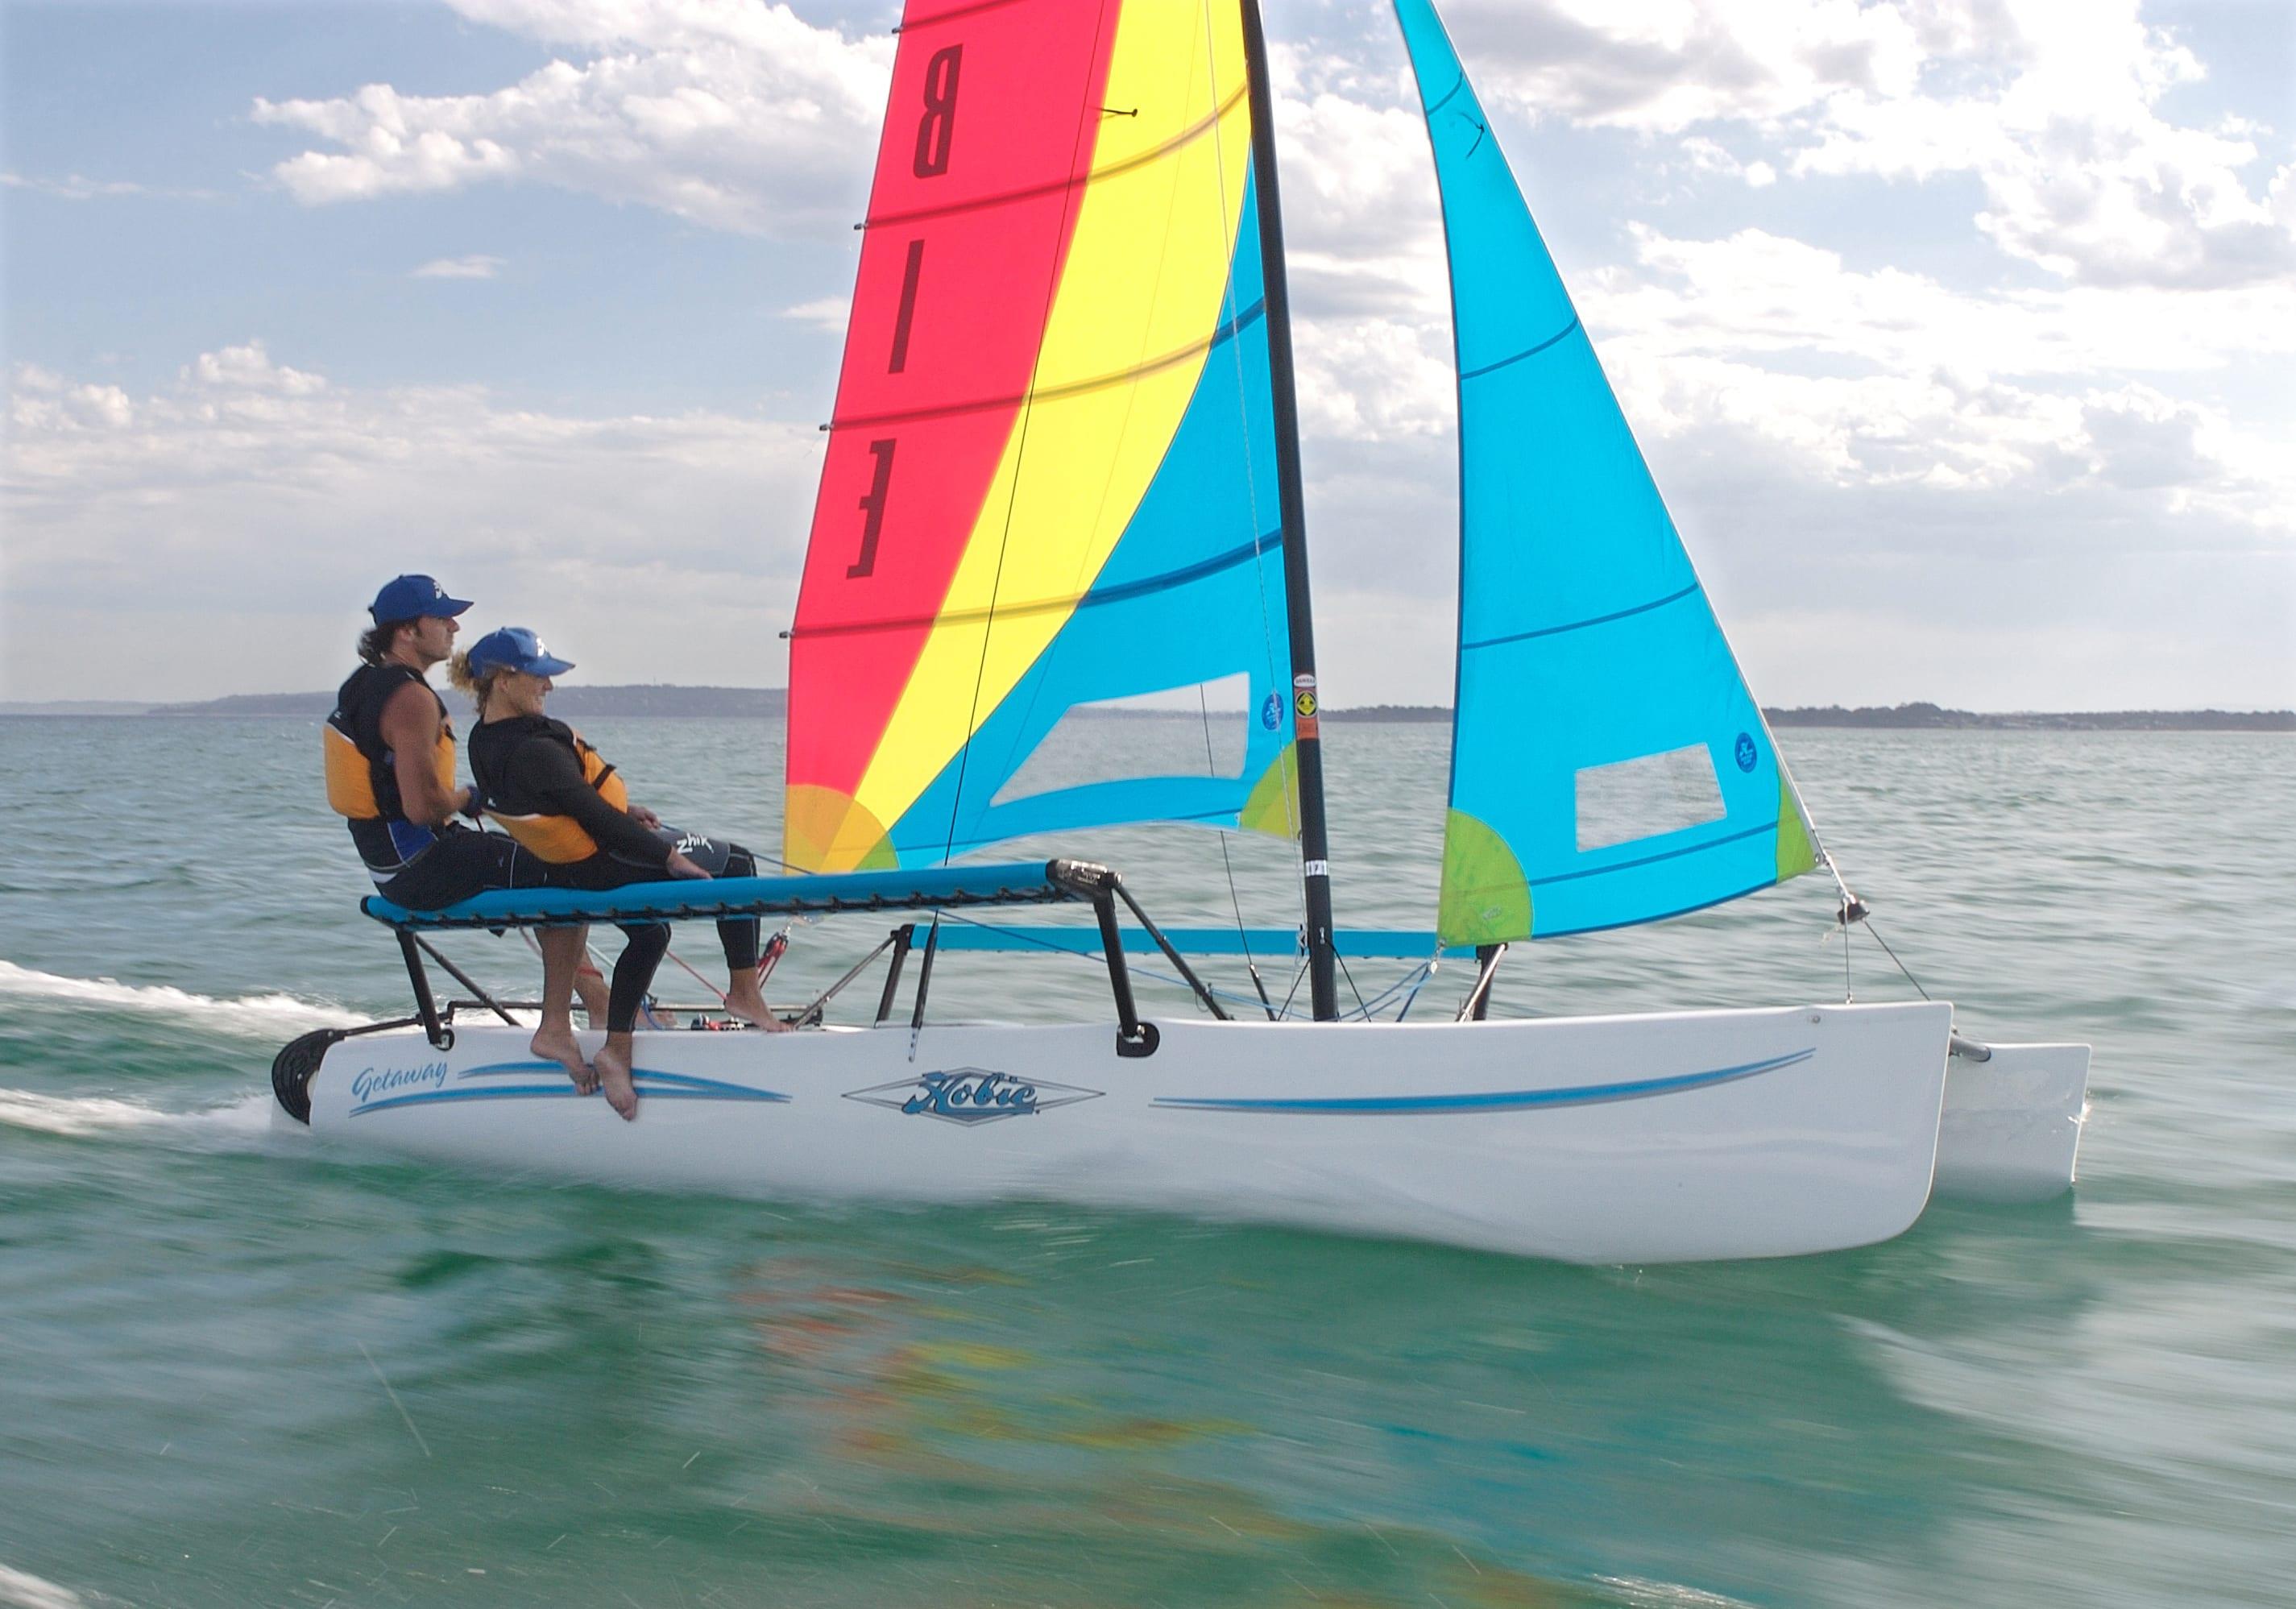 Hobie Cat Boats For Sale